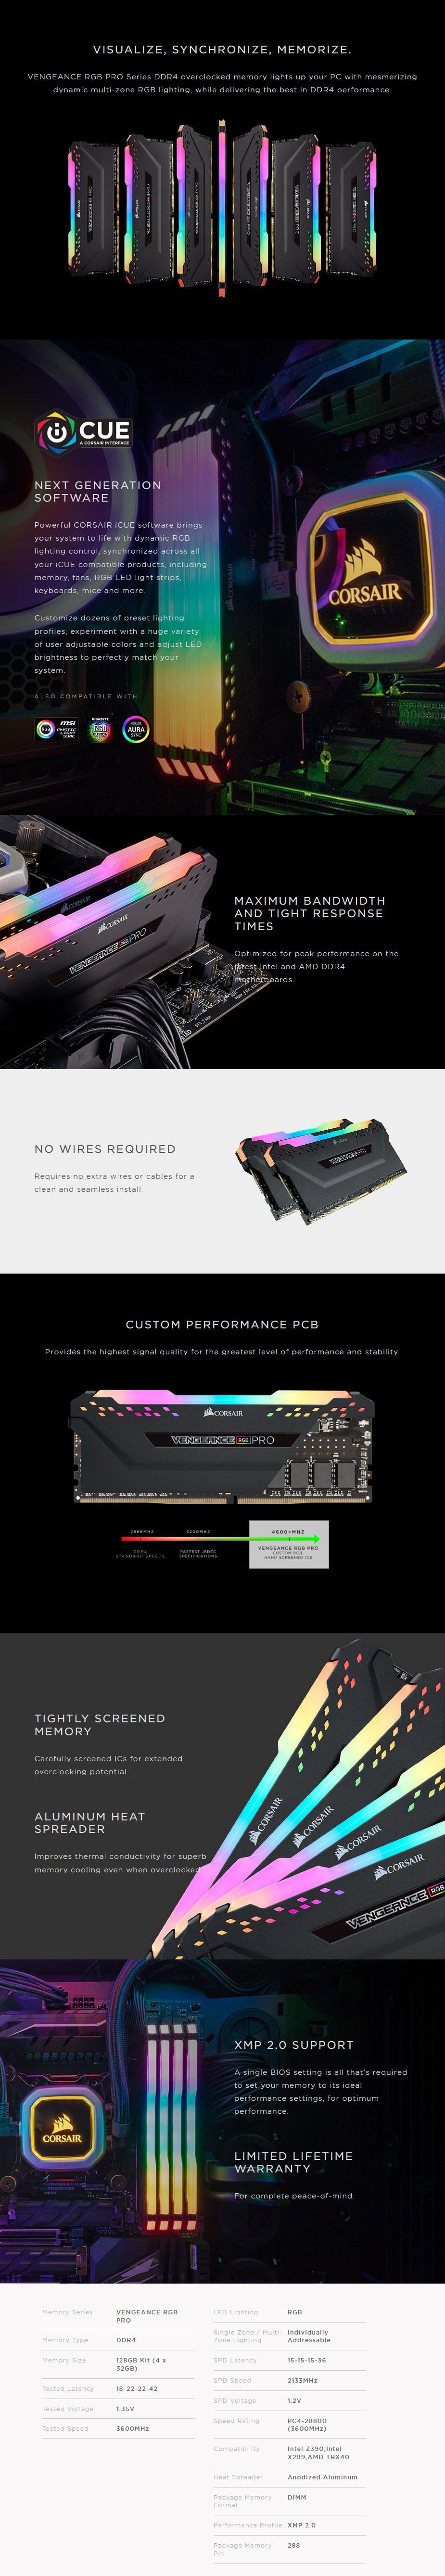 Corsair Vengeance RGB PRO 128GB (4x 32GB) DDR4 3600MHz Memory - Black - Overview 1